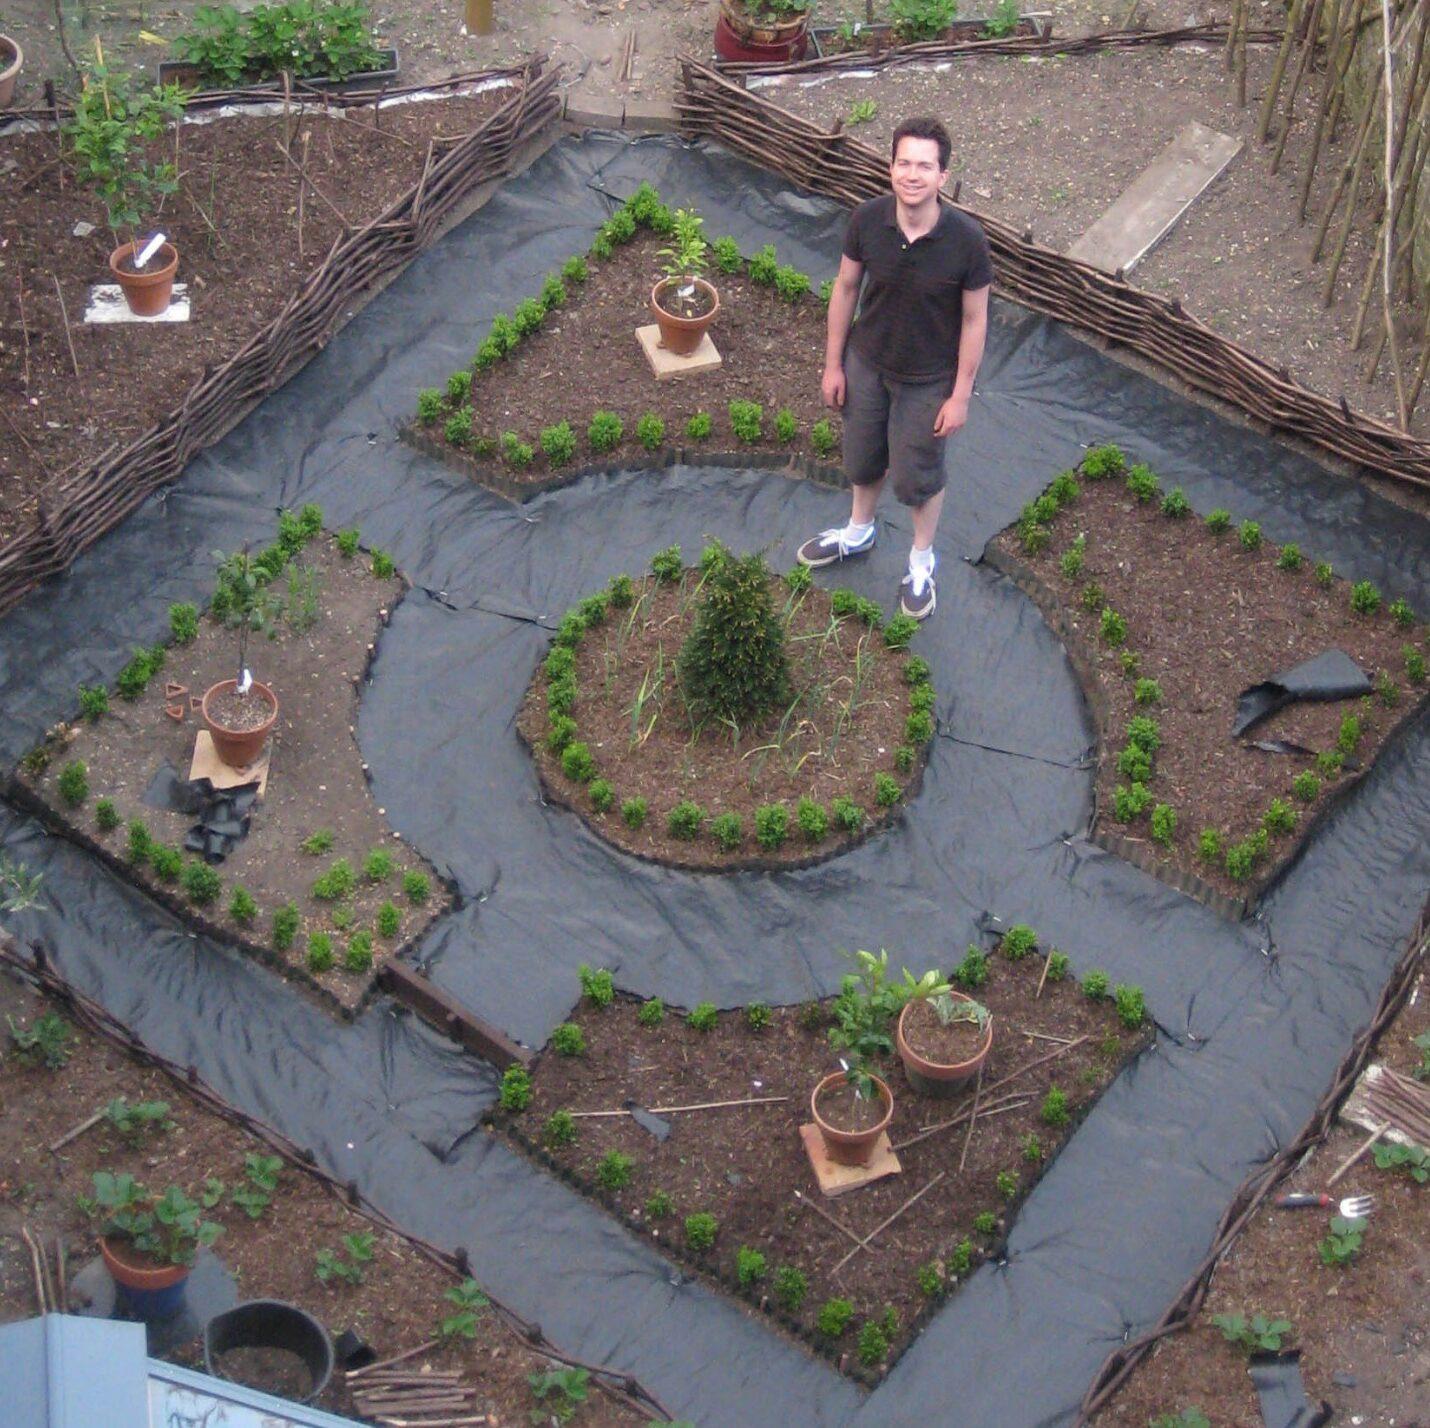 Backyard Botanics cycling gardener